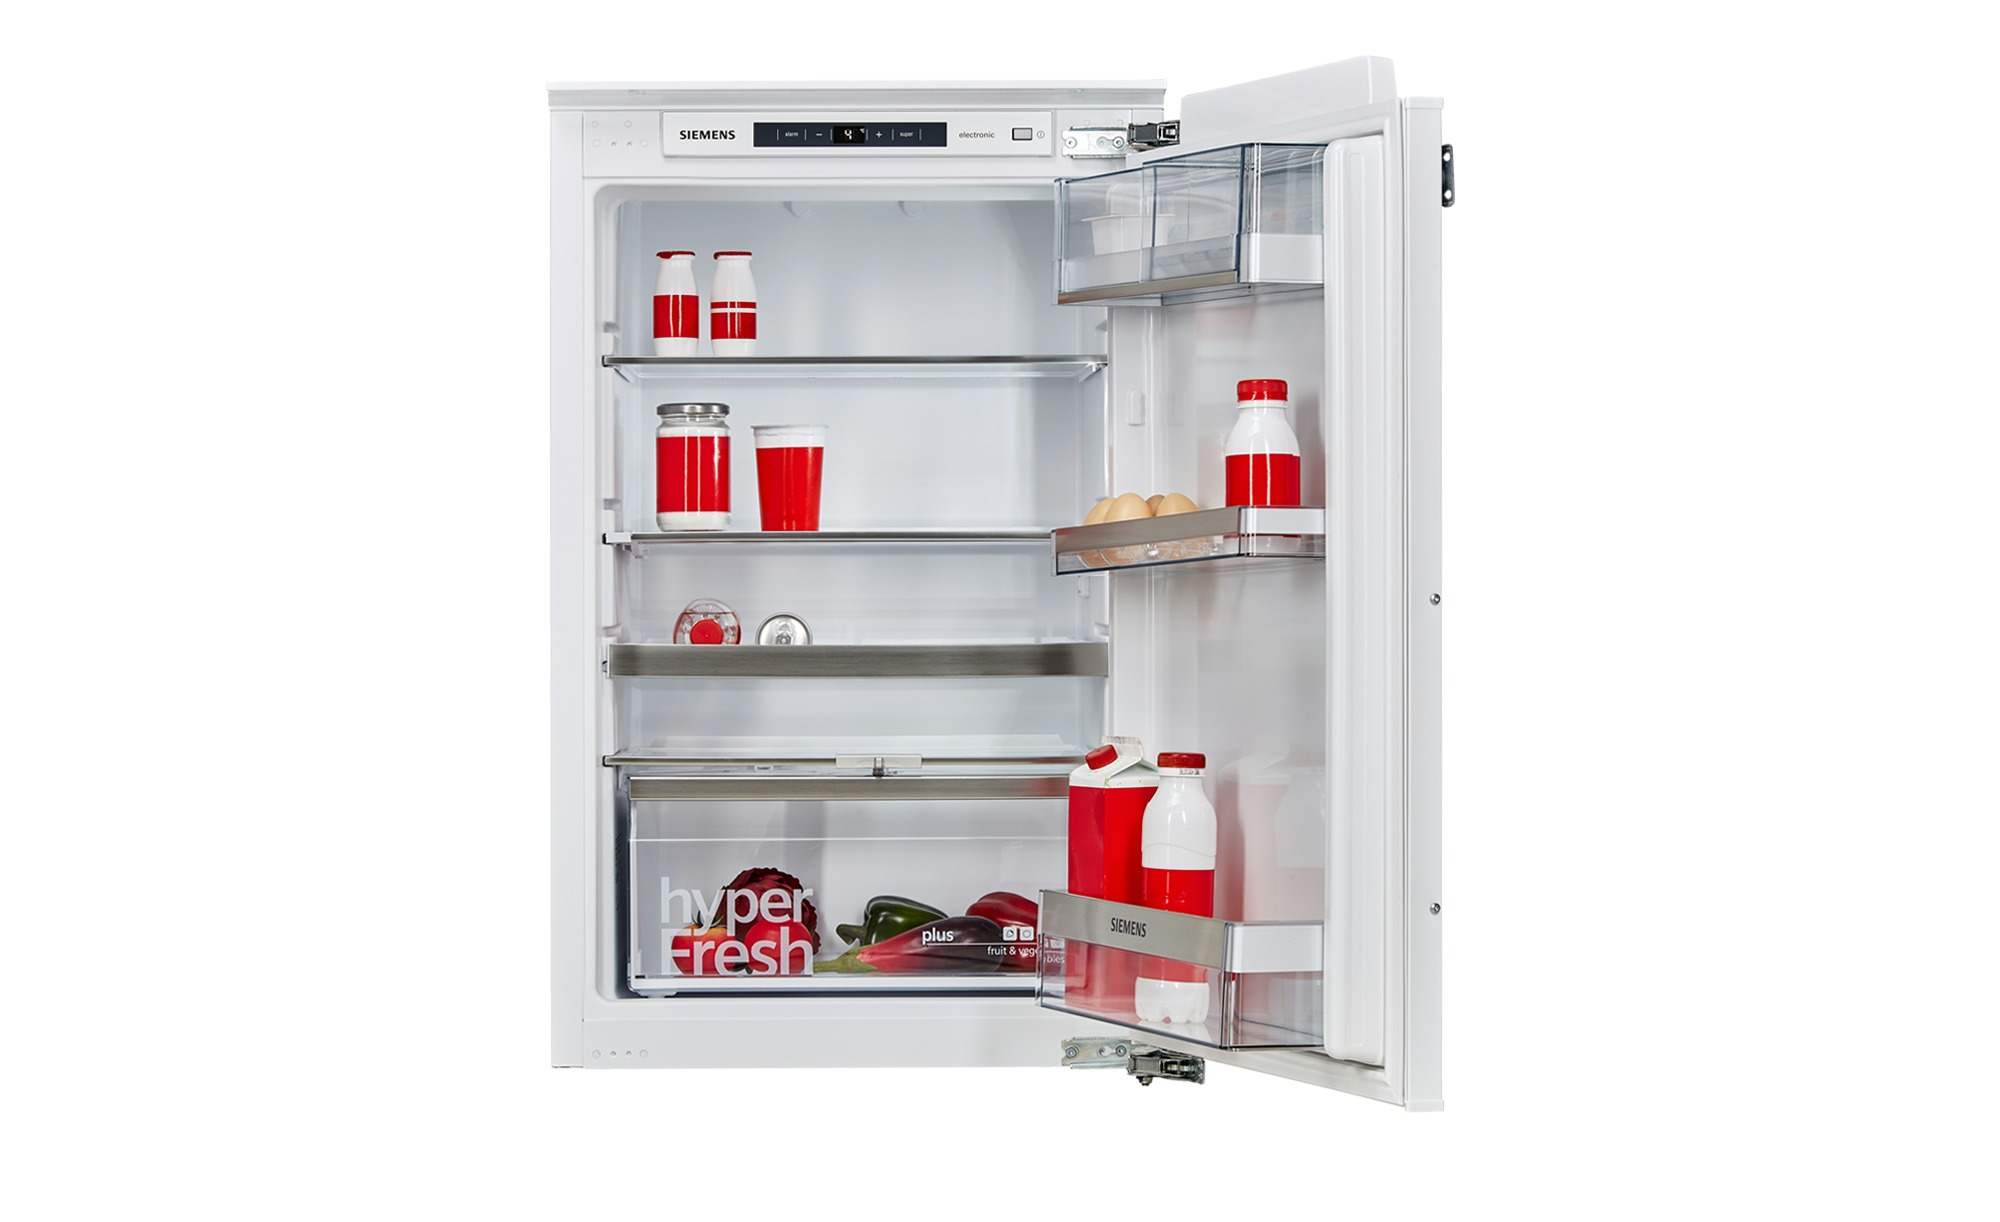 Siemens Kühlschrank A : Siemens einbau kühlschrank ki rad möbel höffner